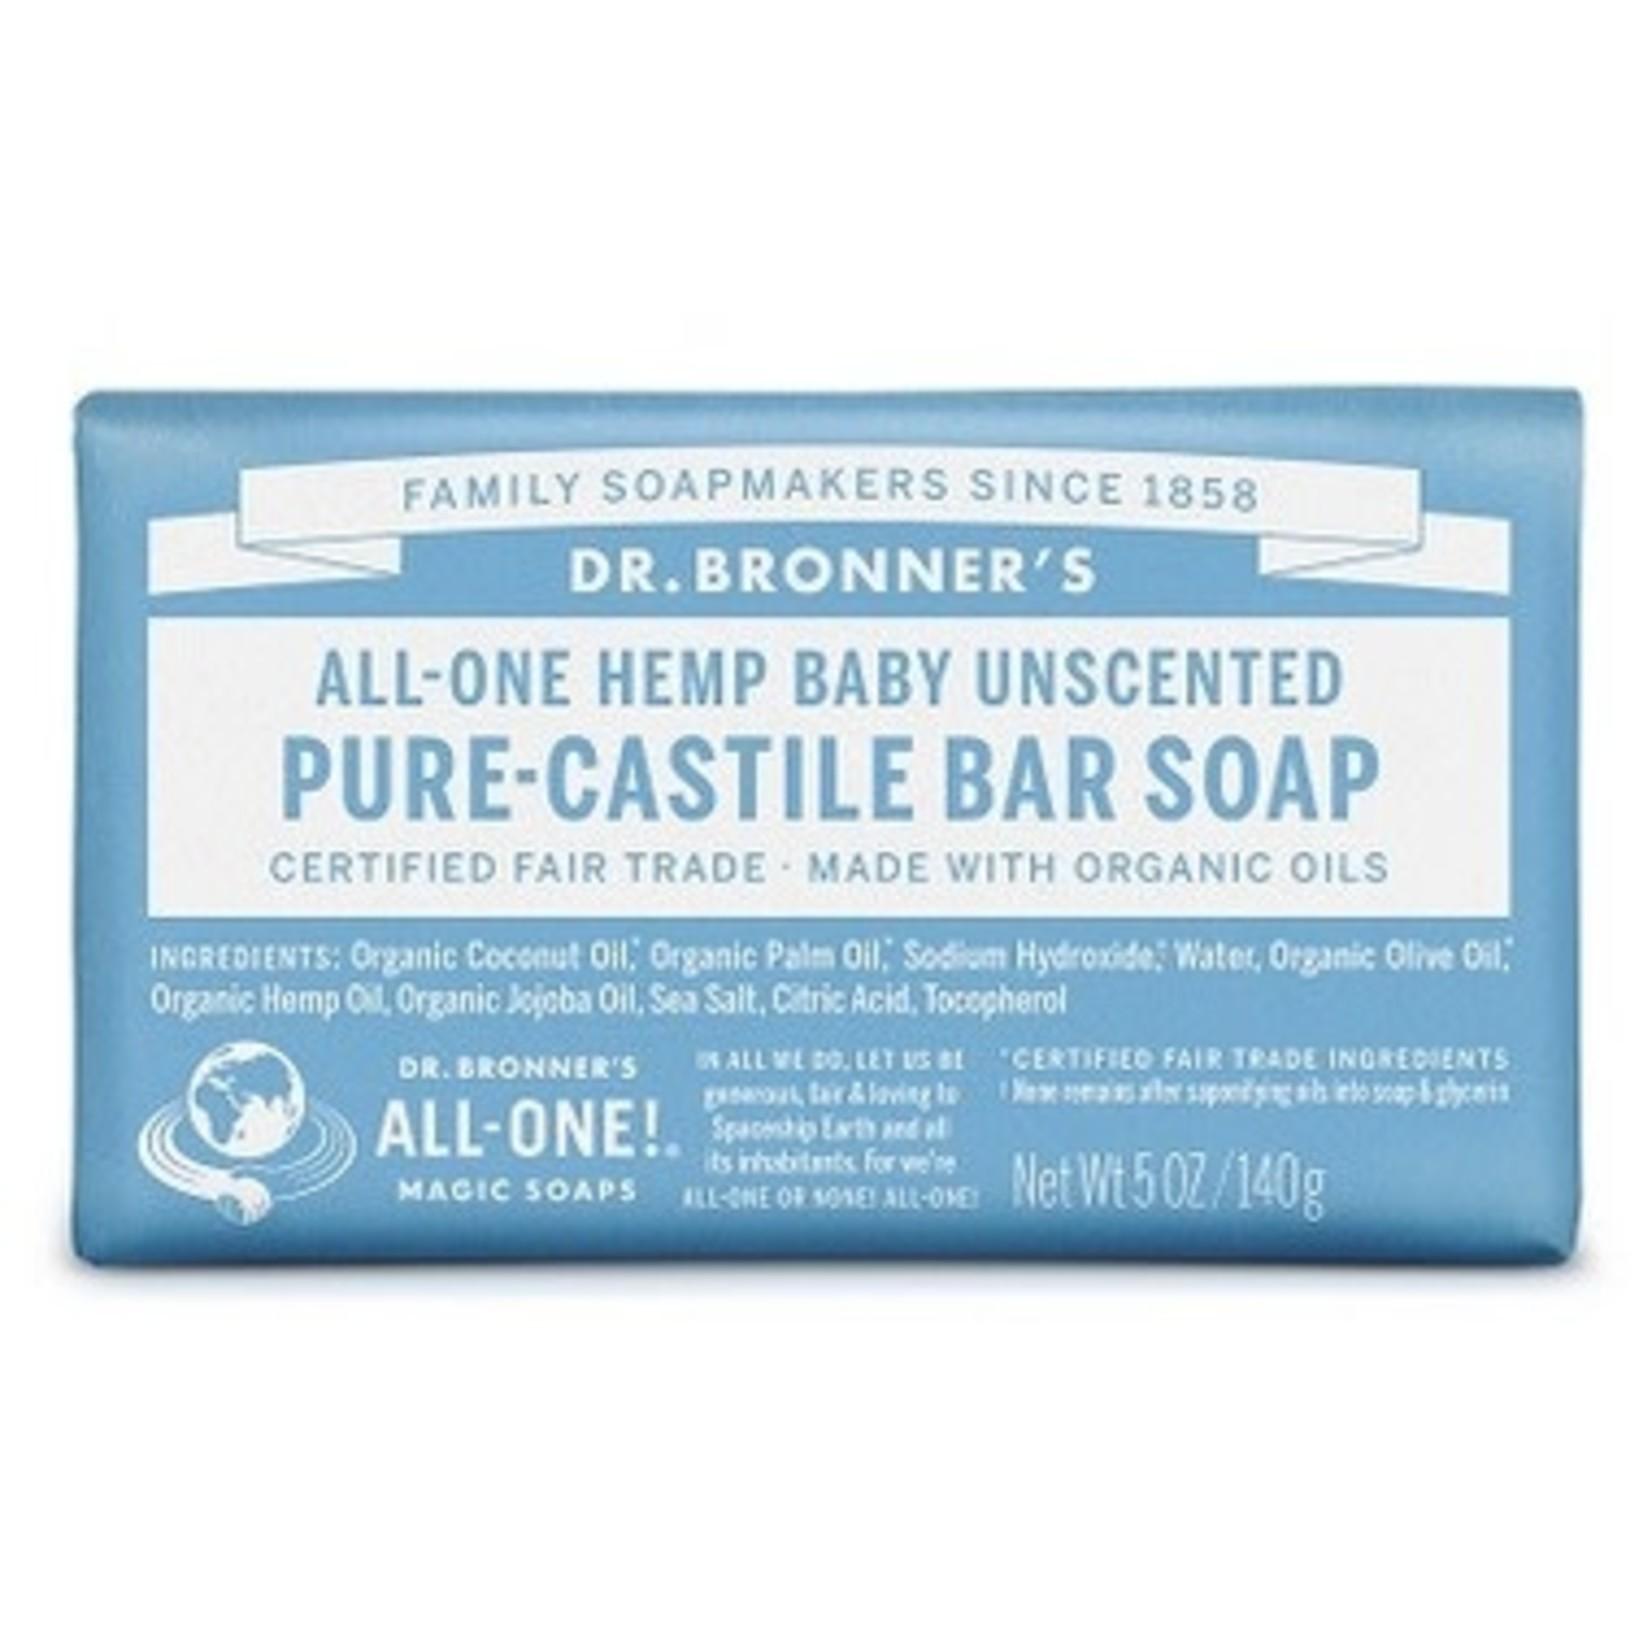 DR. BRONNER'S Baby Pure-Castile Bar Soap